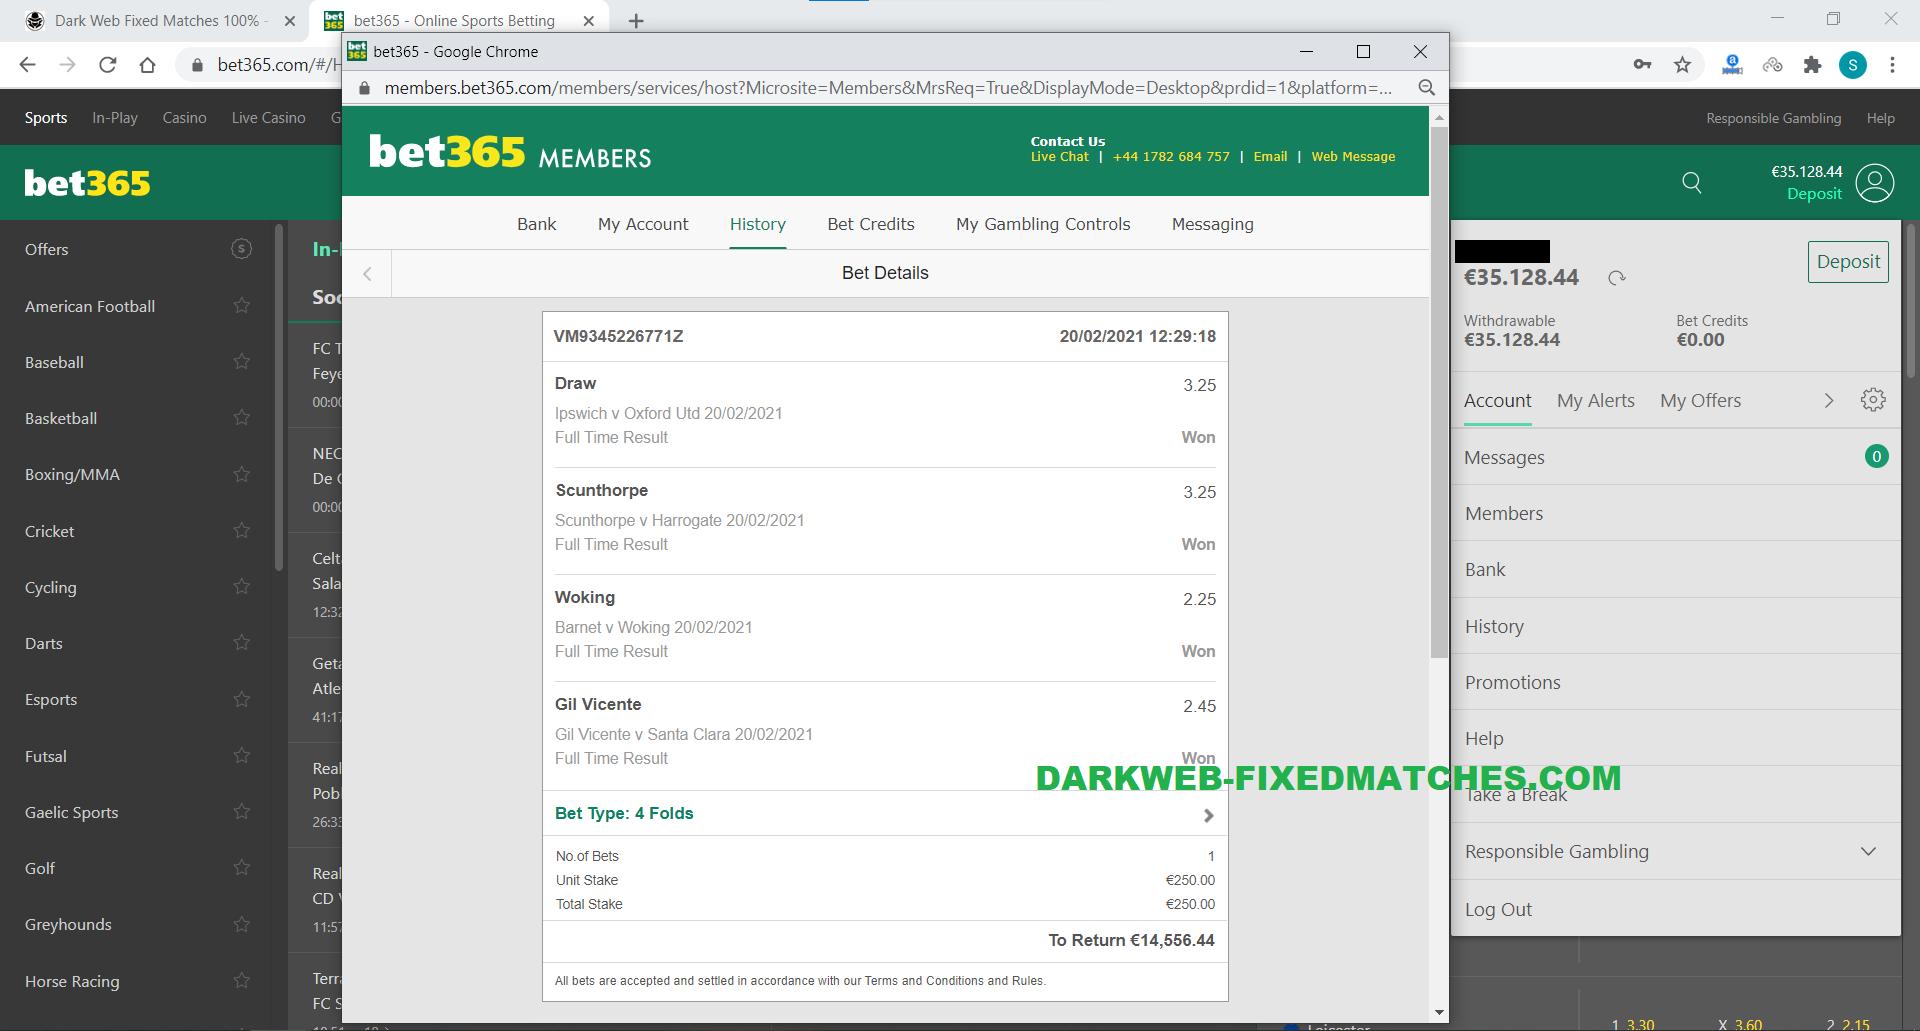 vip combo ticket fixed matches won dark web 20 02